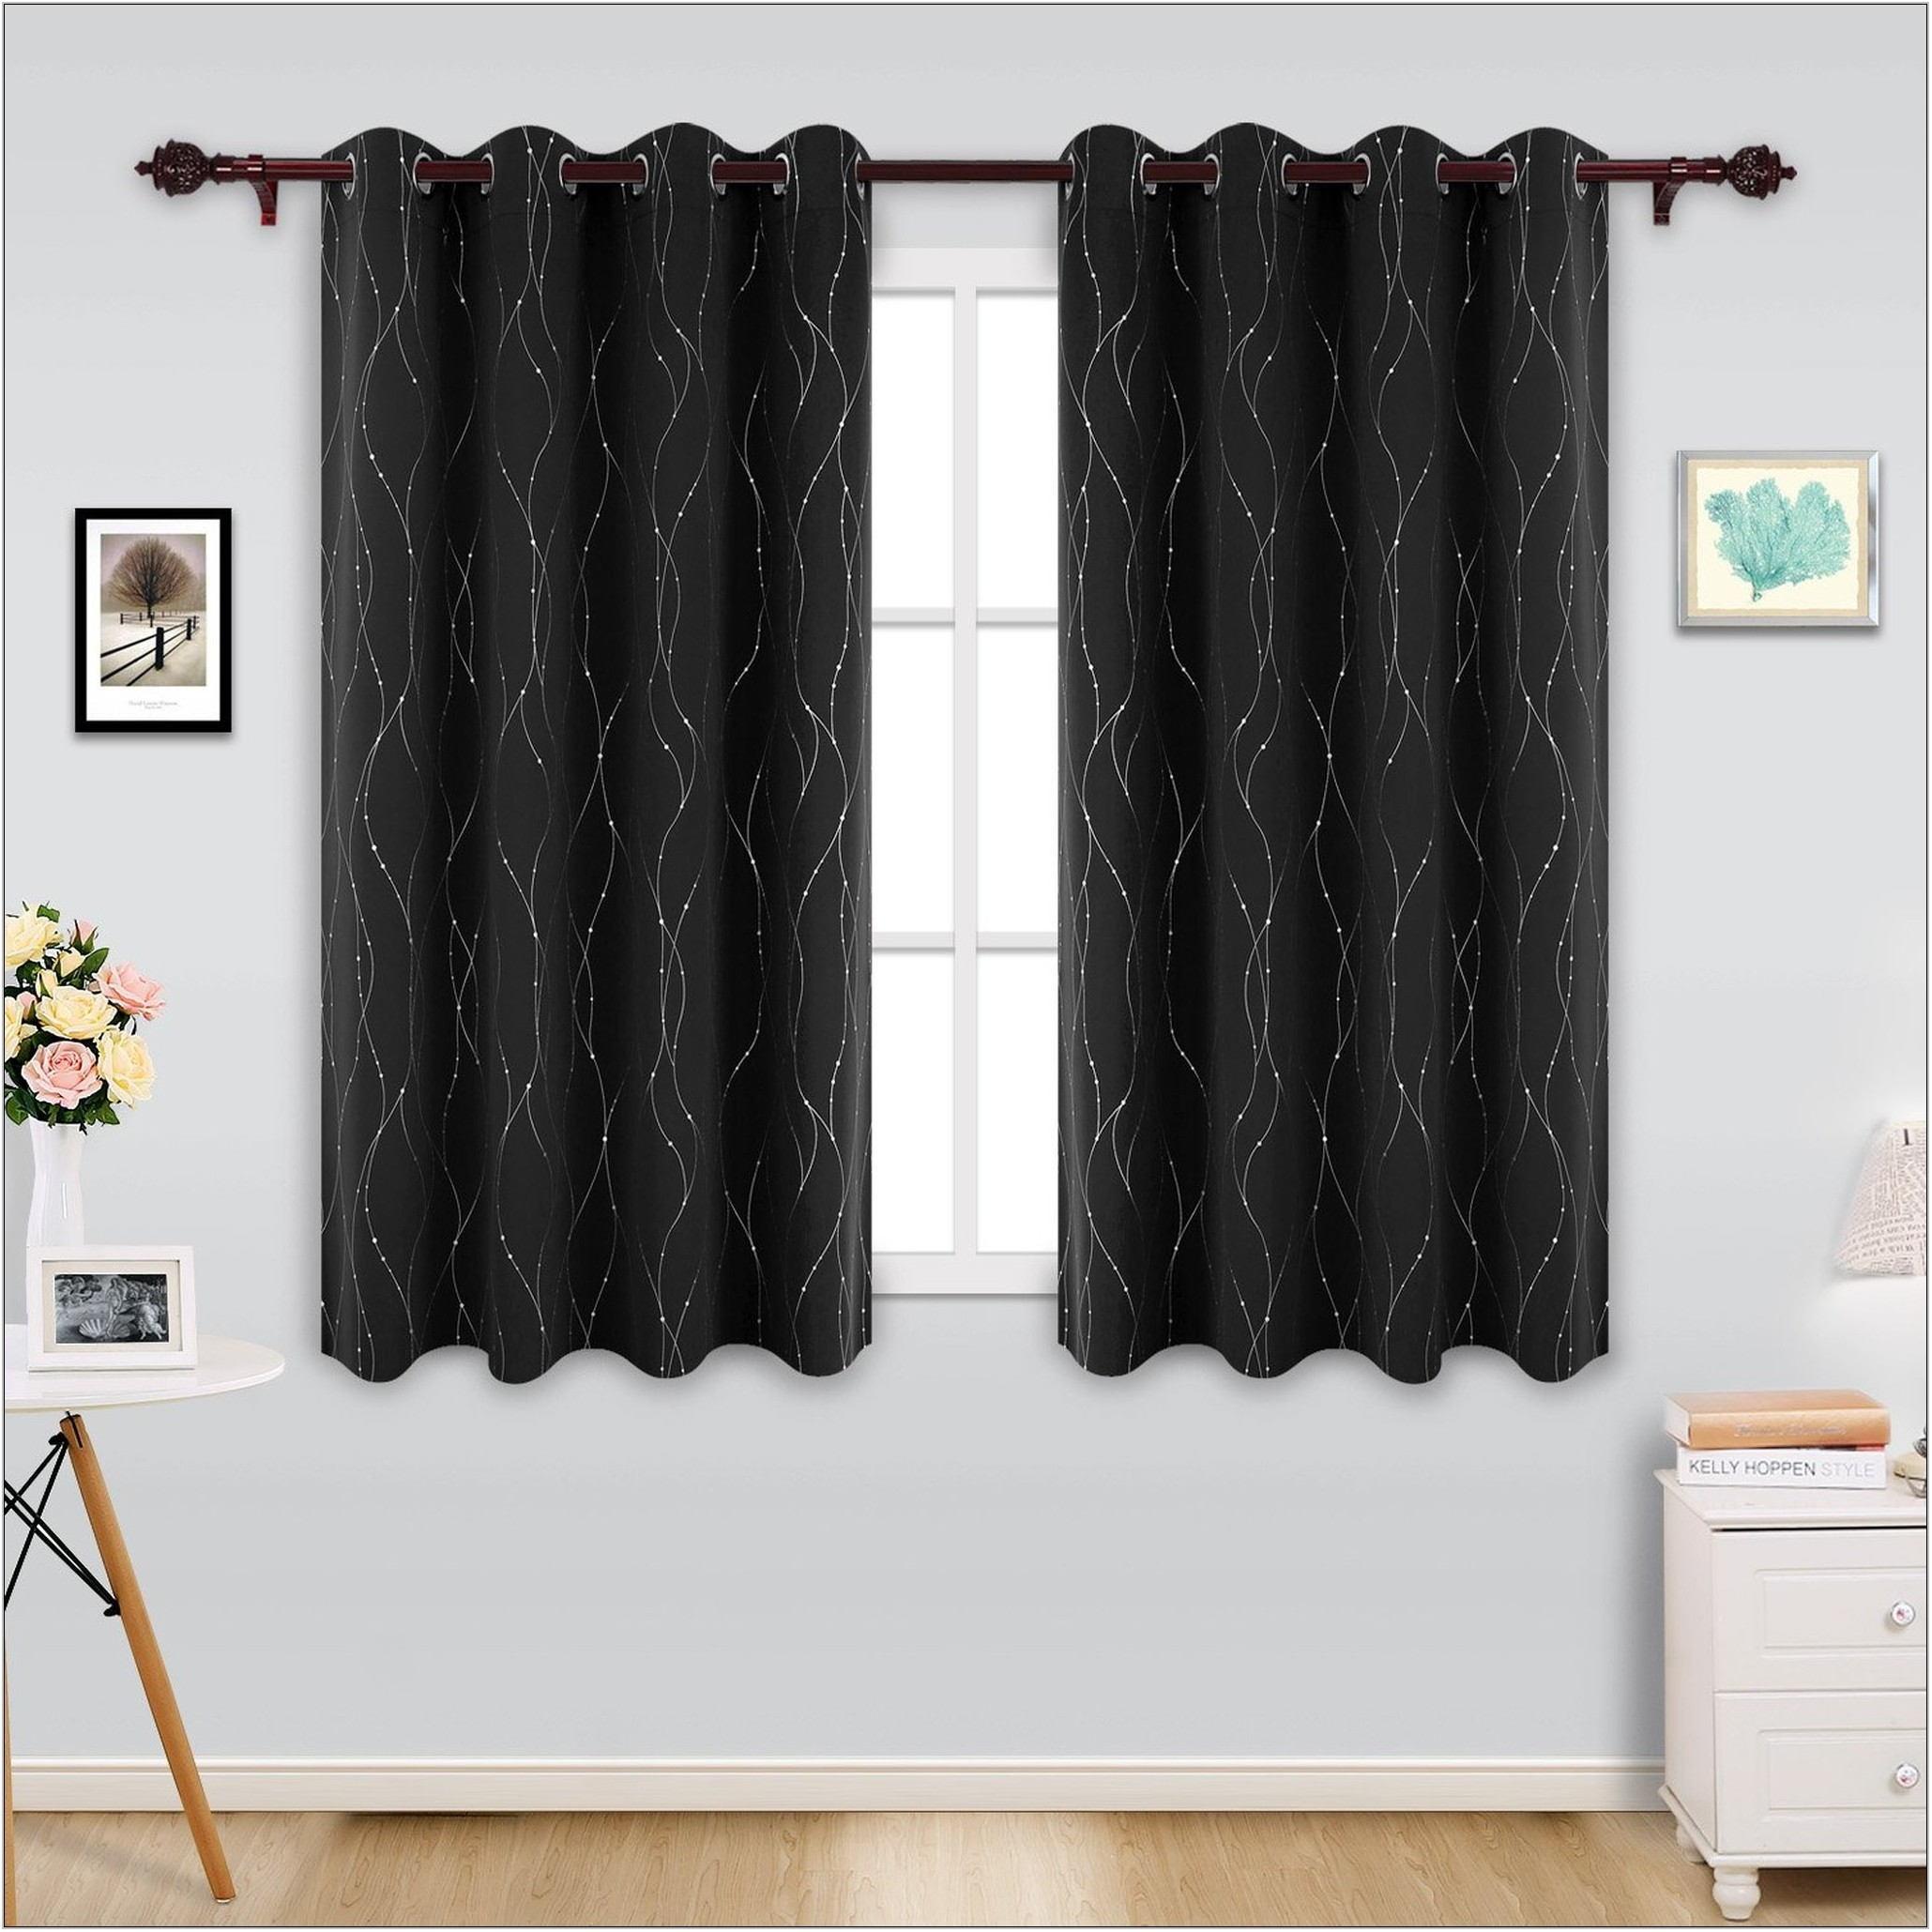 Grommet Living Room Curtains